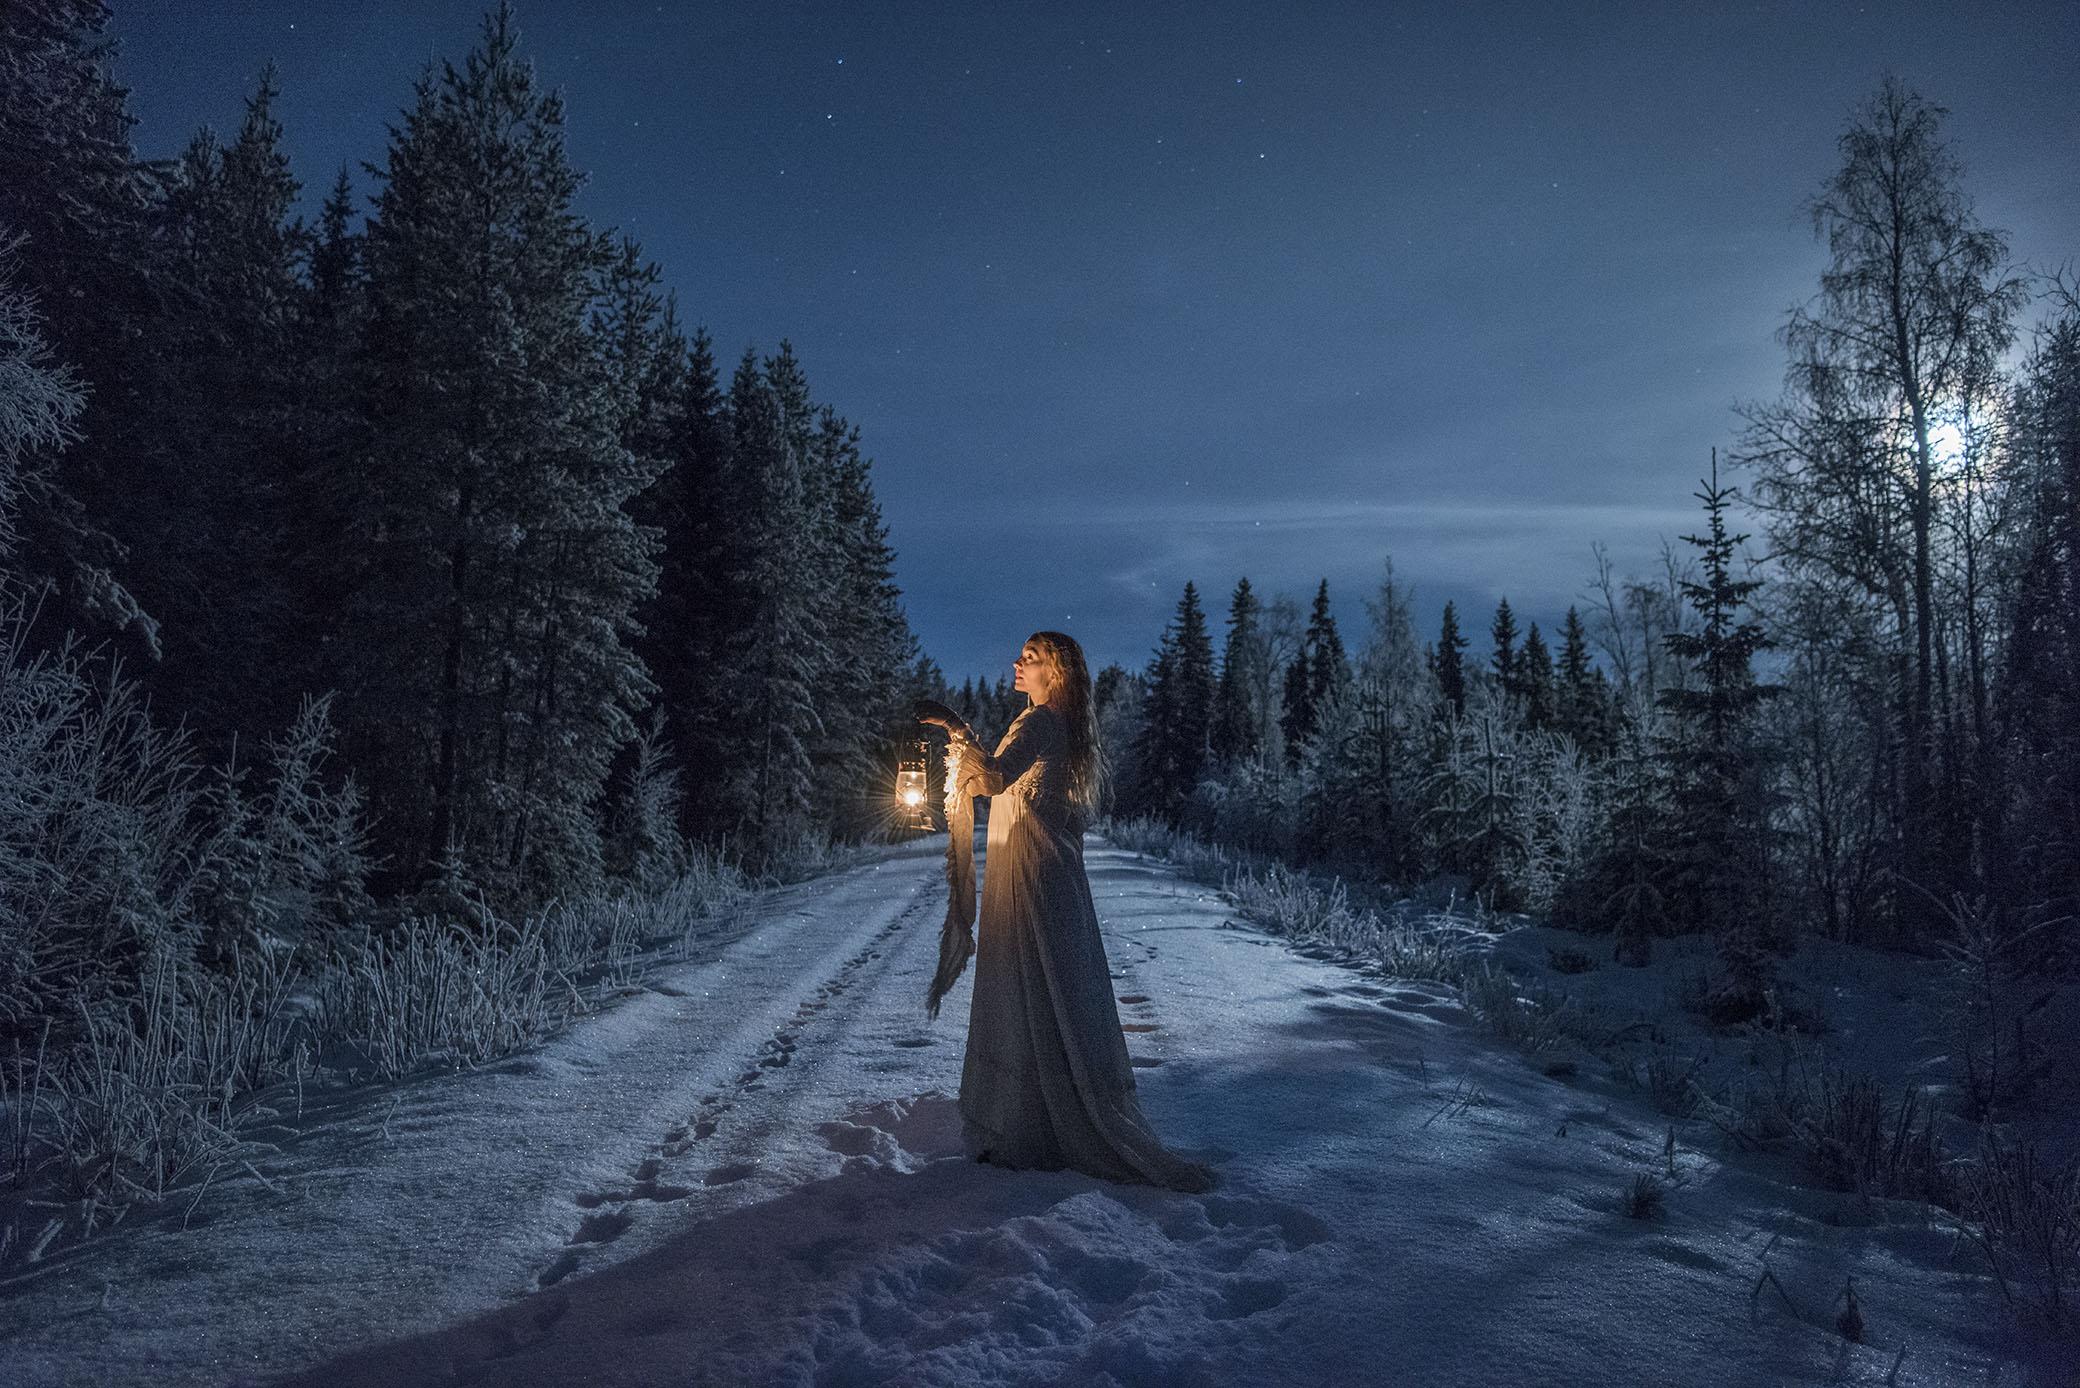 winter solstice - photo #12